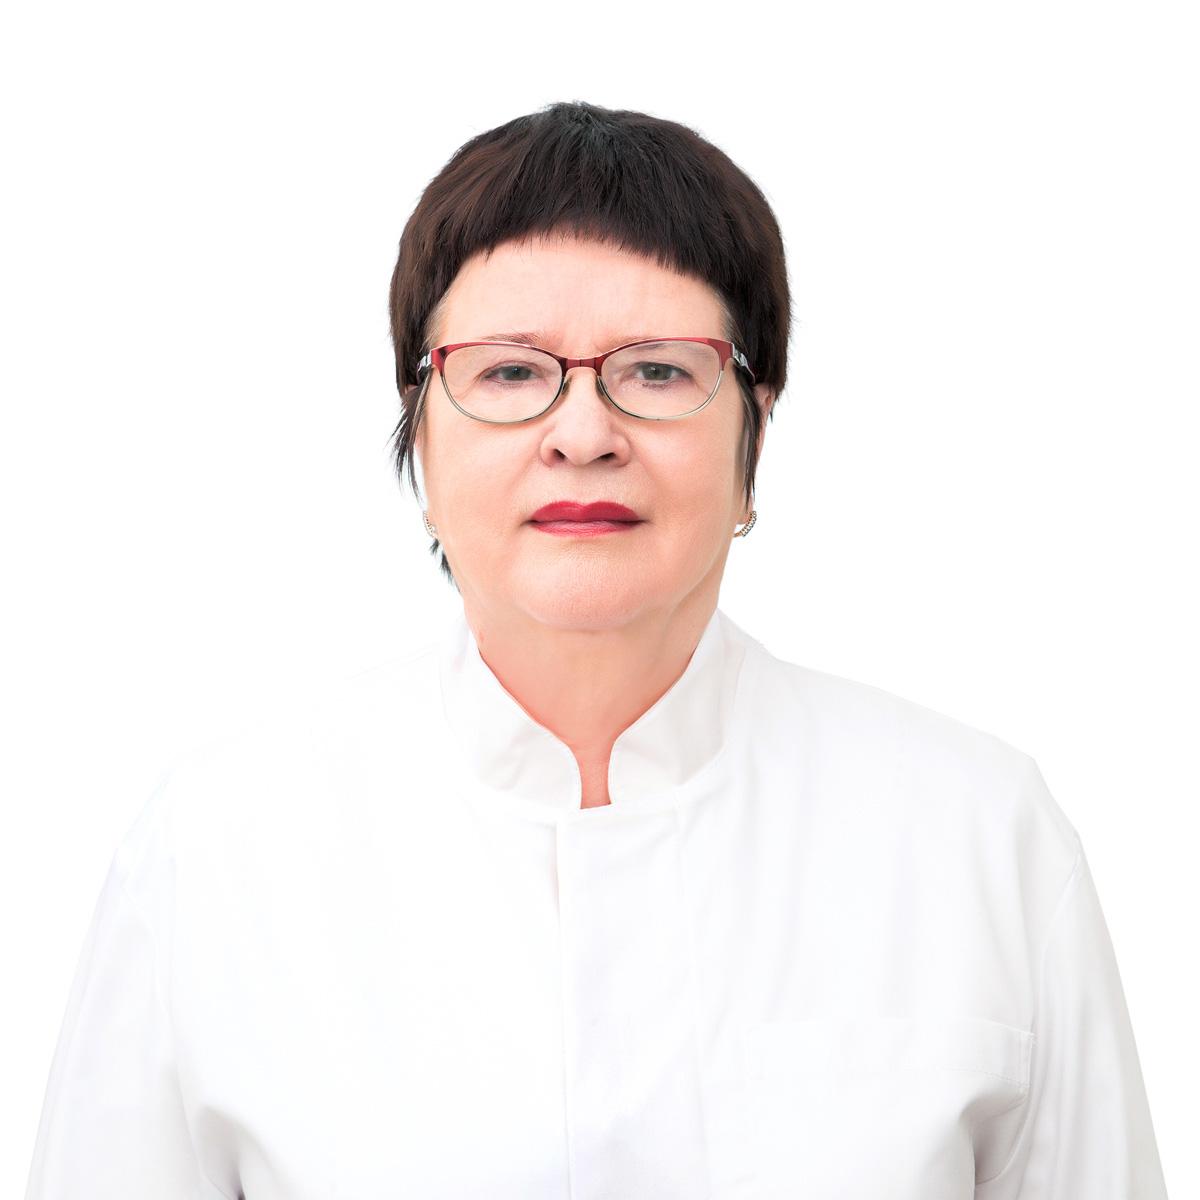 Узунова Анна Николаевна